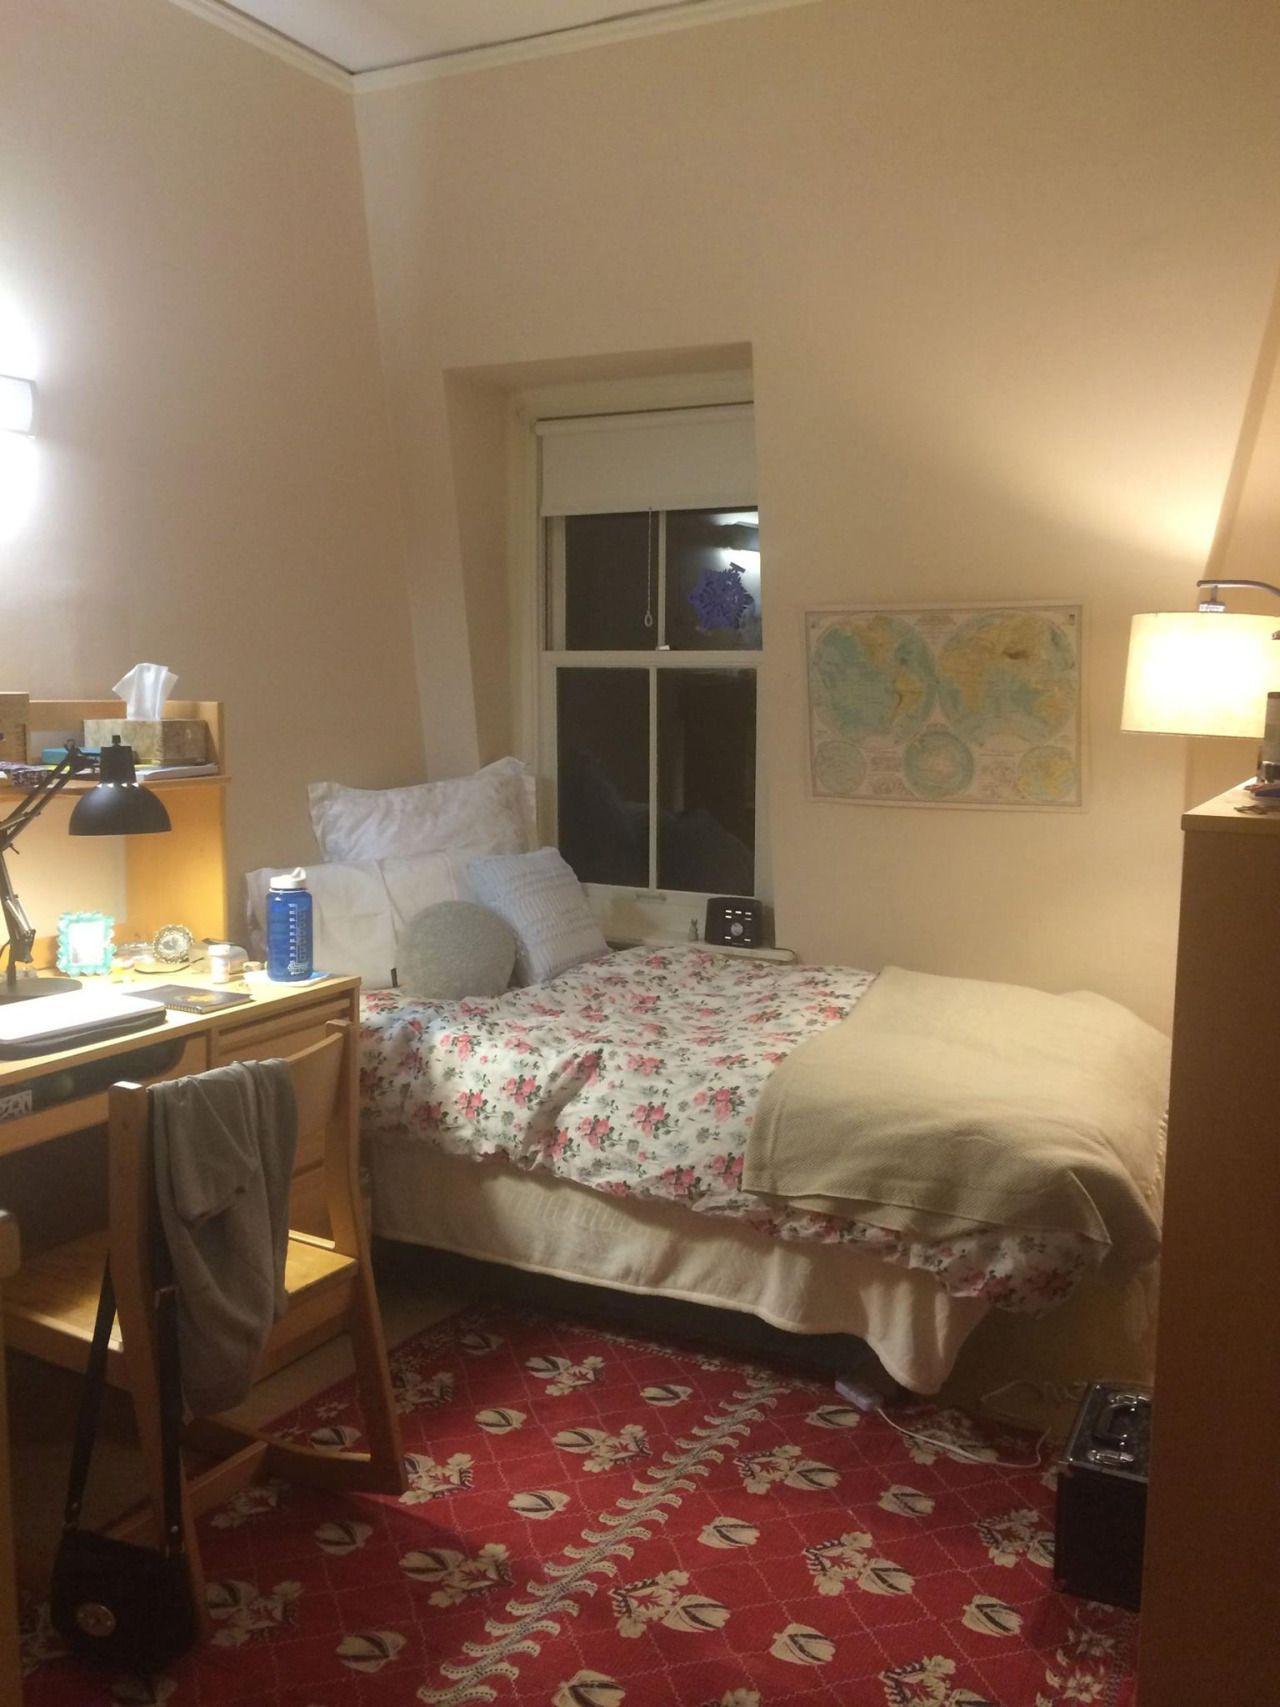 SmithBySmithies in 2020 | Cool dorm rooms, Dorm room, Room